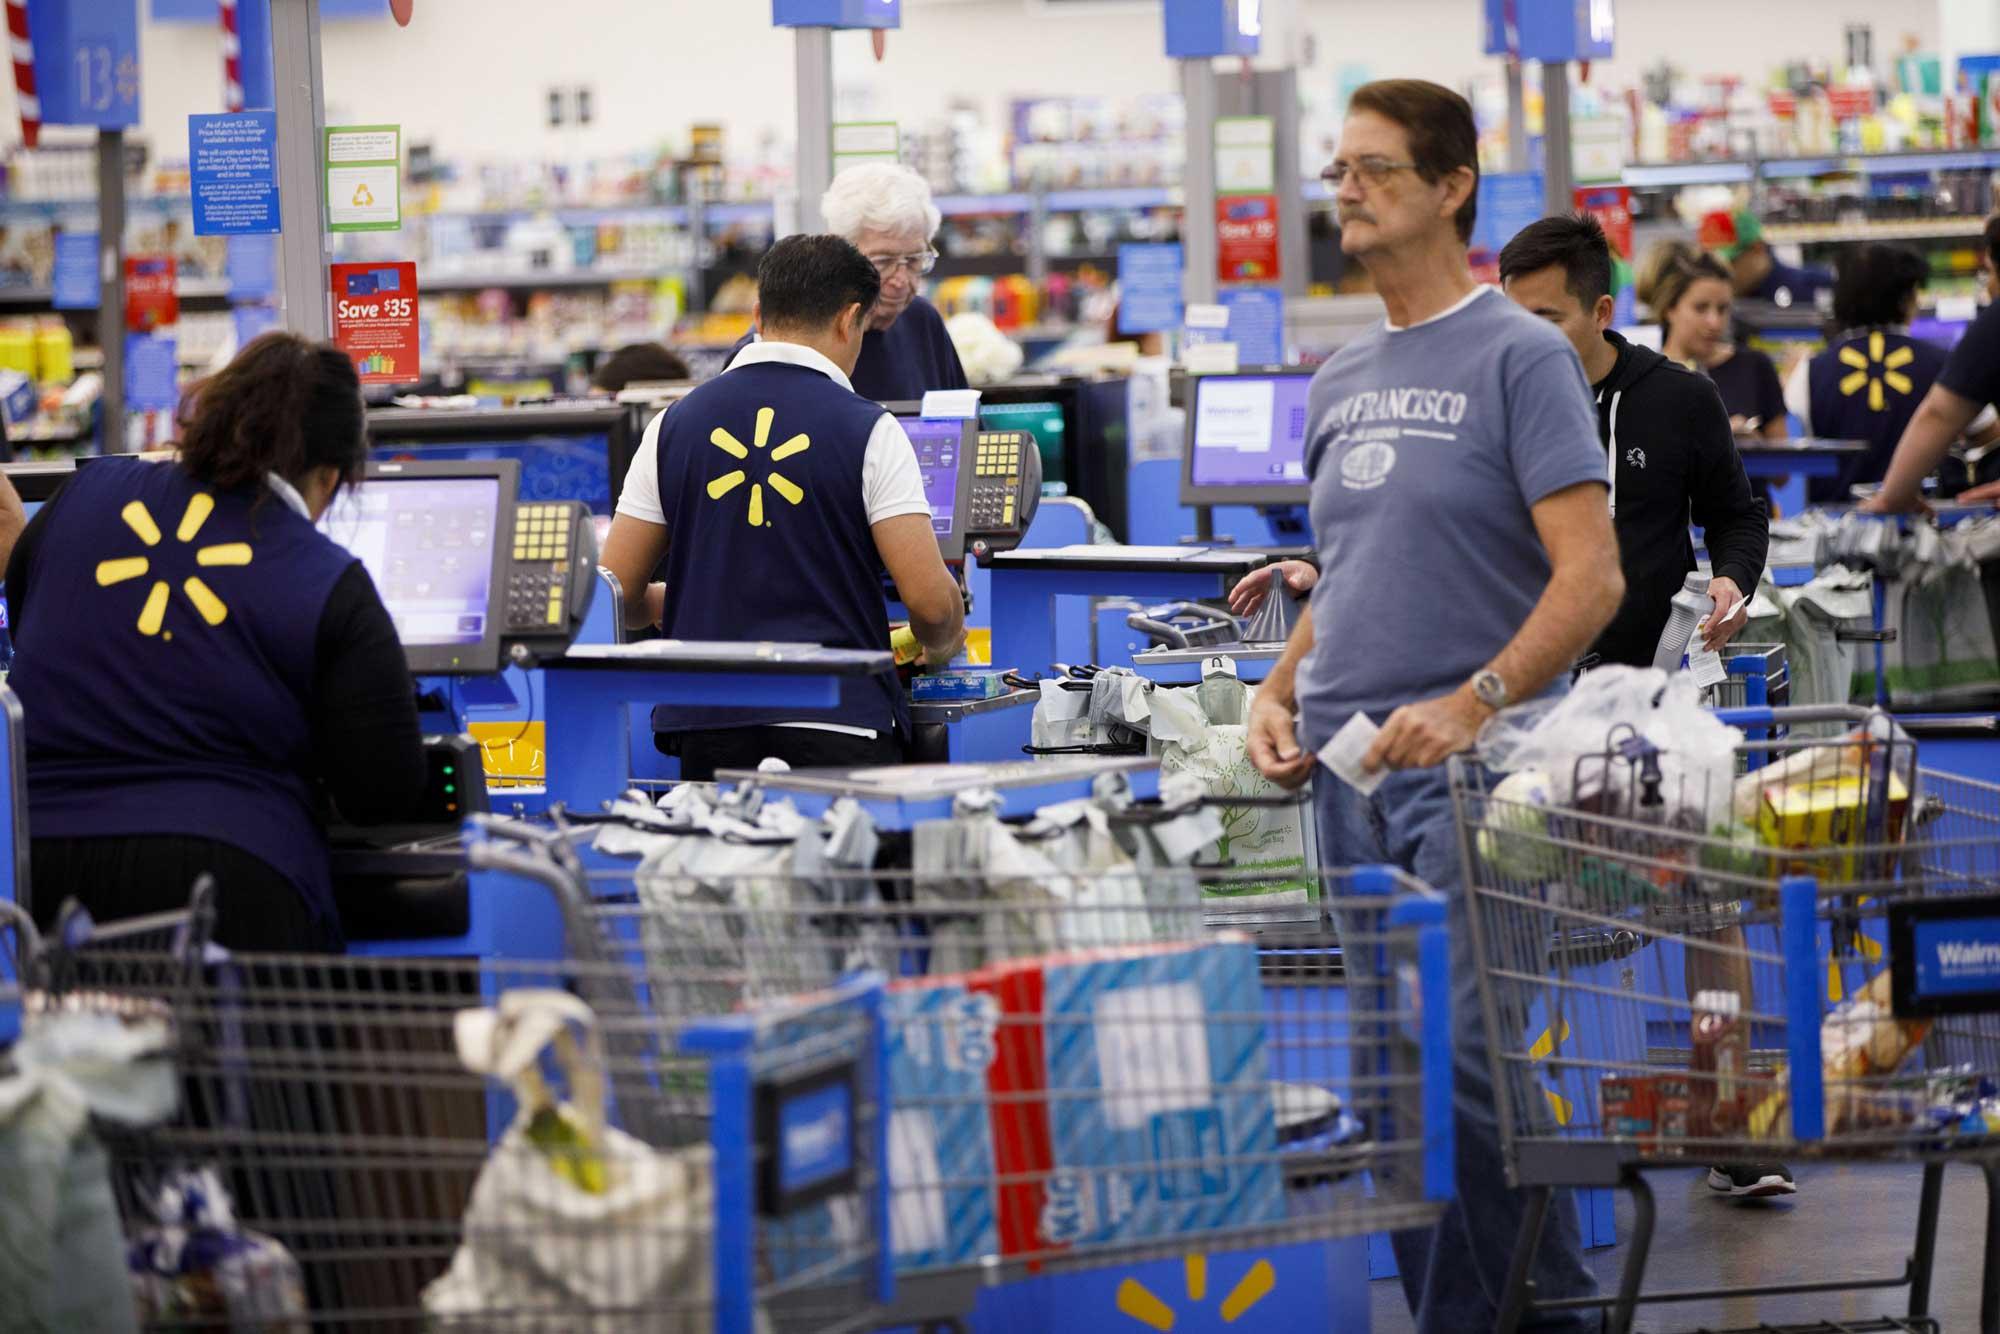 GP: Walmart cashiers shoppers 171116